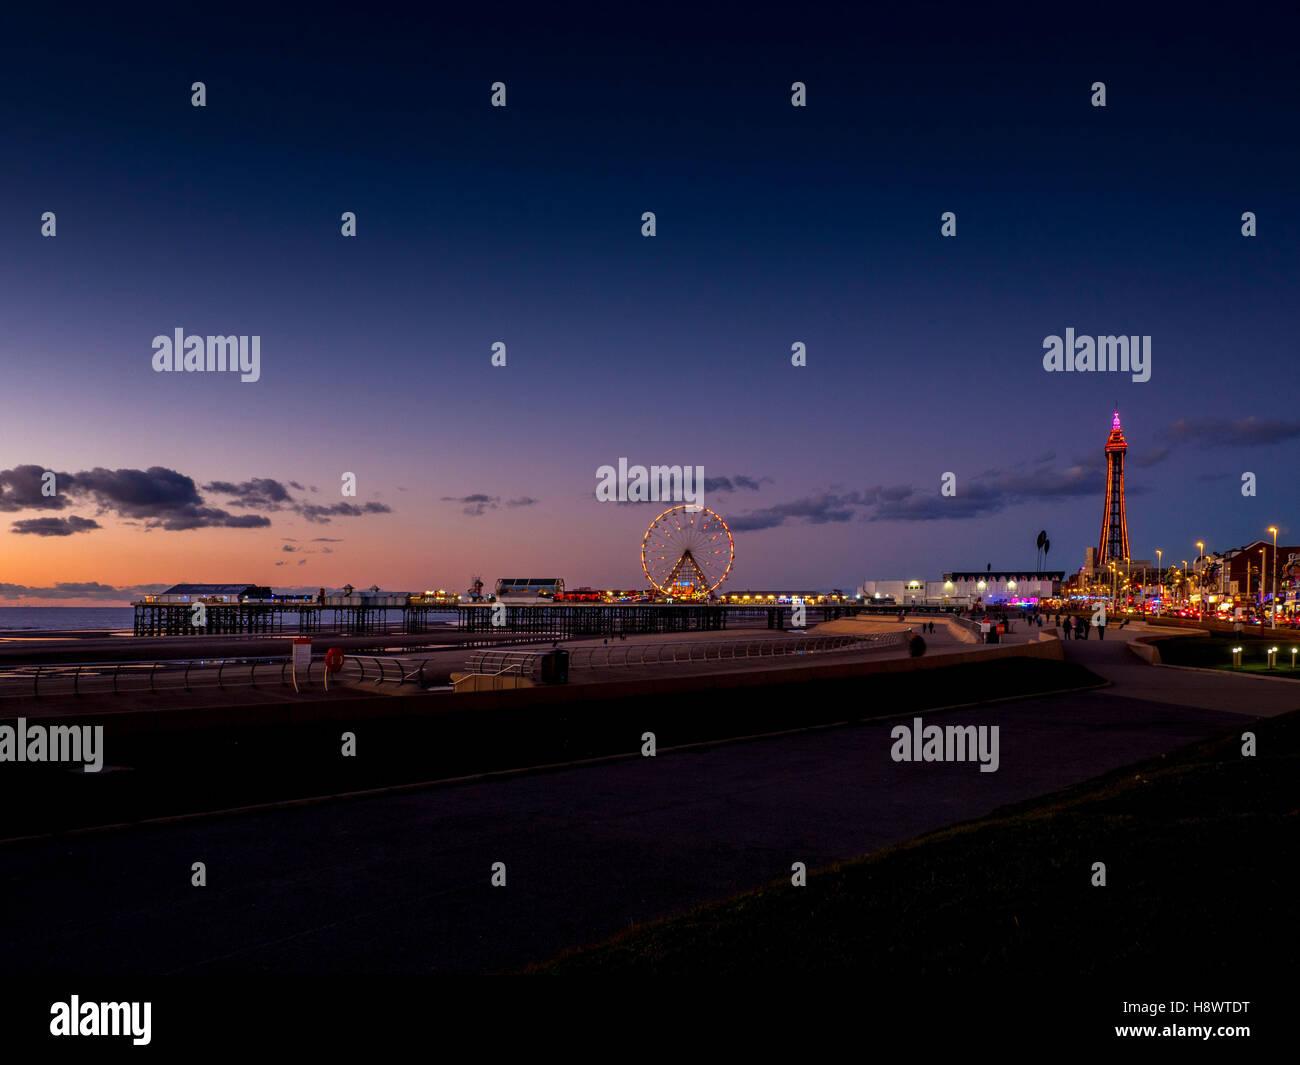 Blackpool Tower, Central Pier, Promenade und Illuminationen, Abend, Blackpool, Lancashire, UK. Stockbild